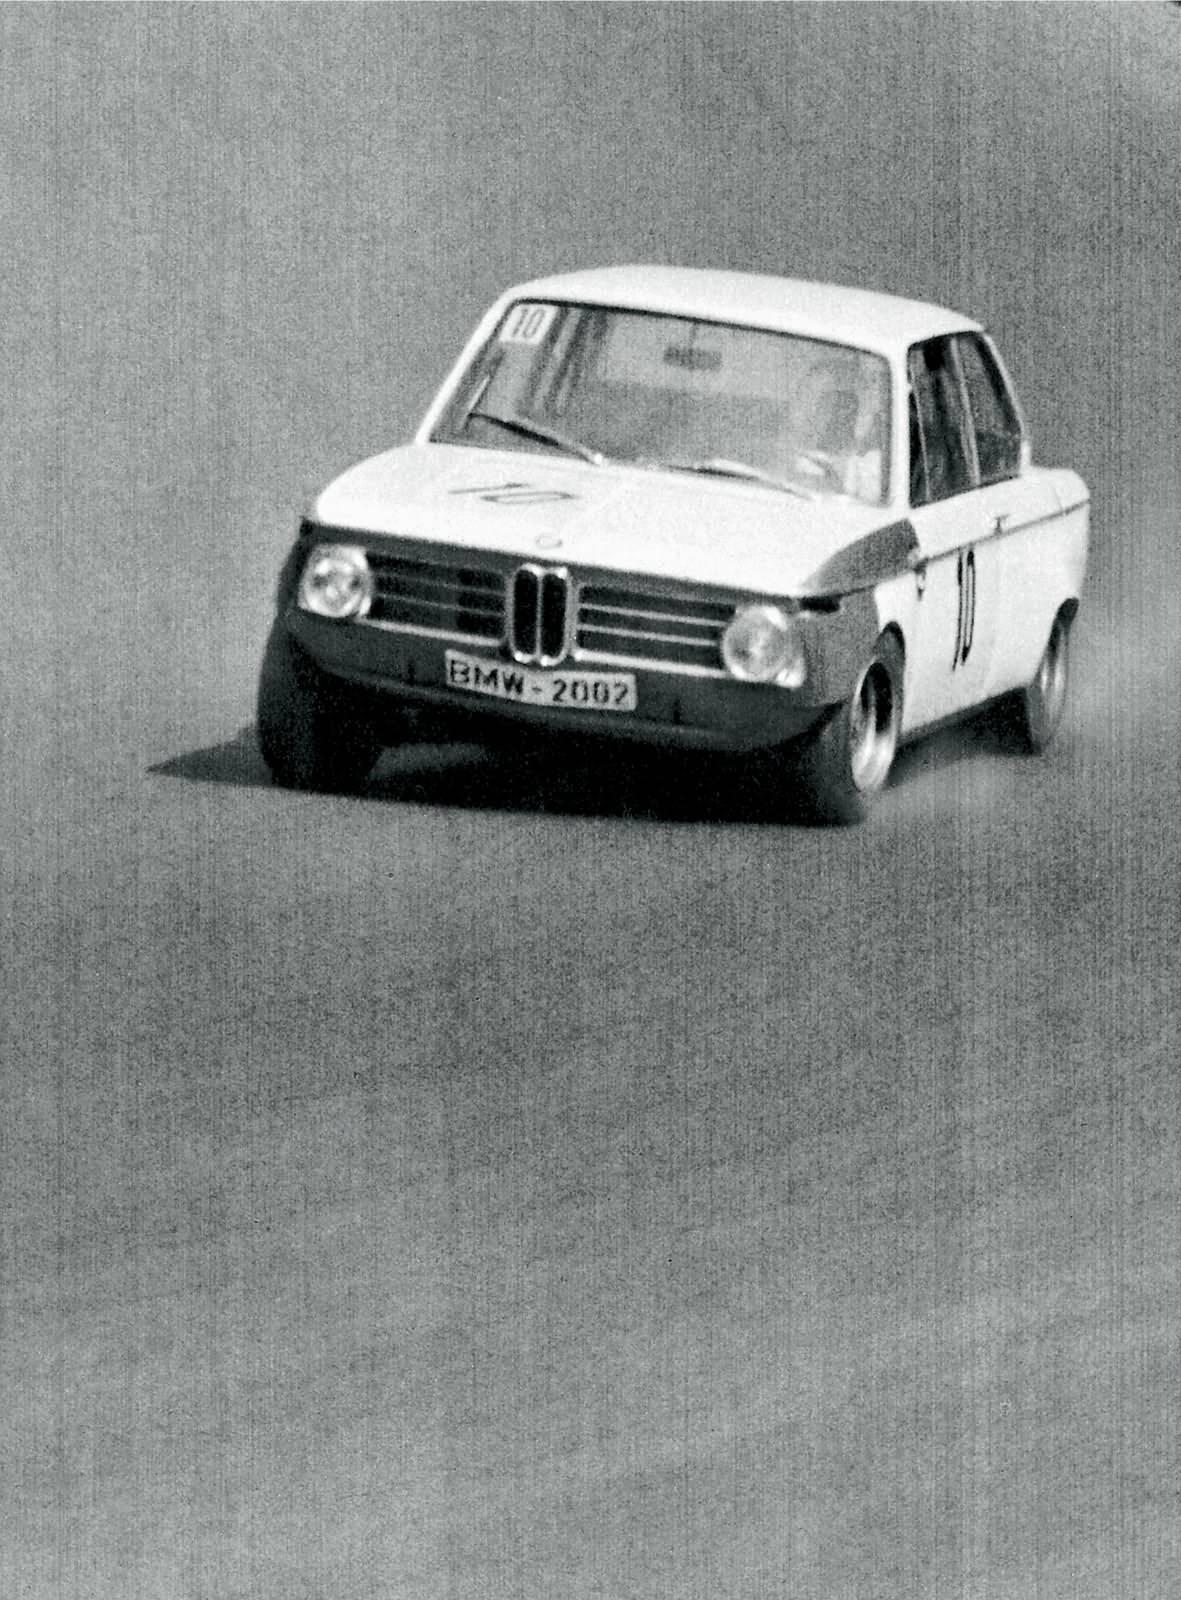 BMW 2002 am Nürburgring 1968